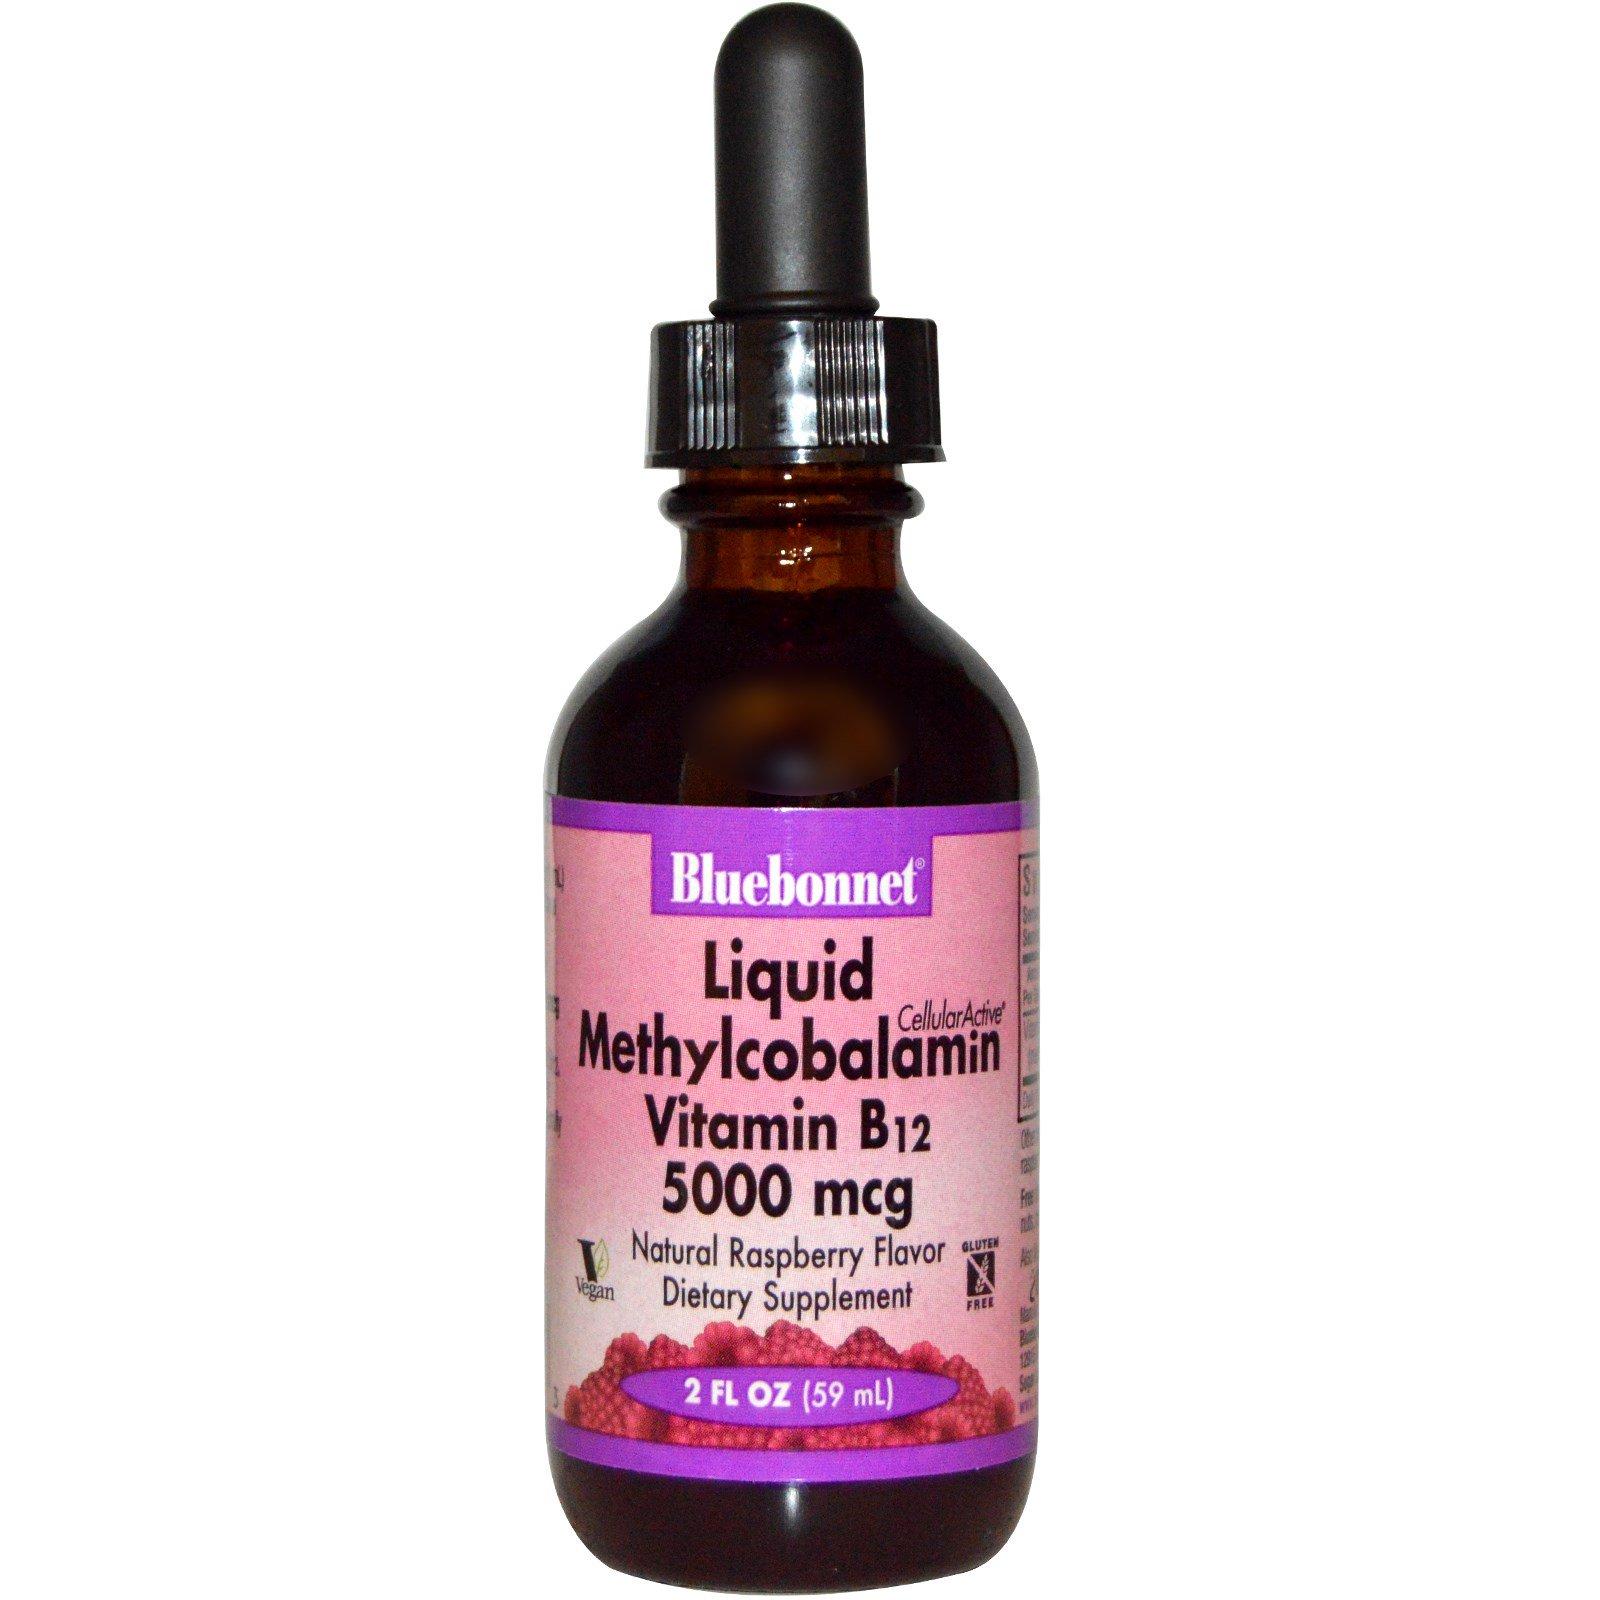 Bluebonnet Nutrition, Жидкий метилкобаламин, Витамин B12, Натуральный вкус малины, 5000 мкг, 2 жидких унции (59 мл)